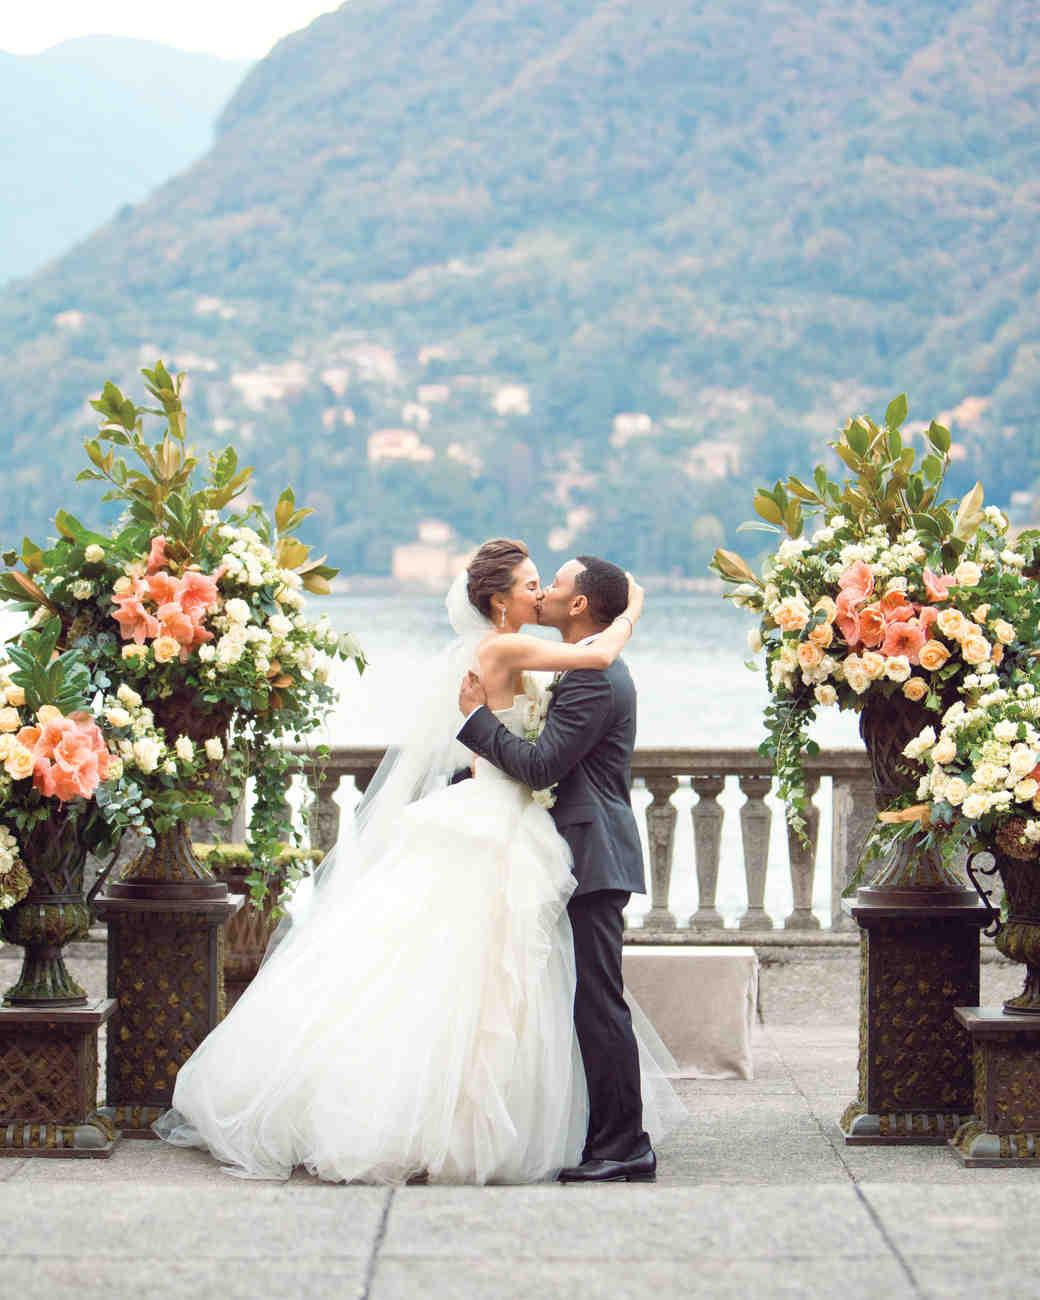 John legend chrissy yeigen wedding pictures